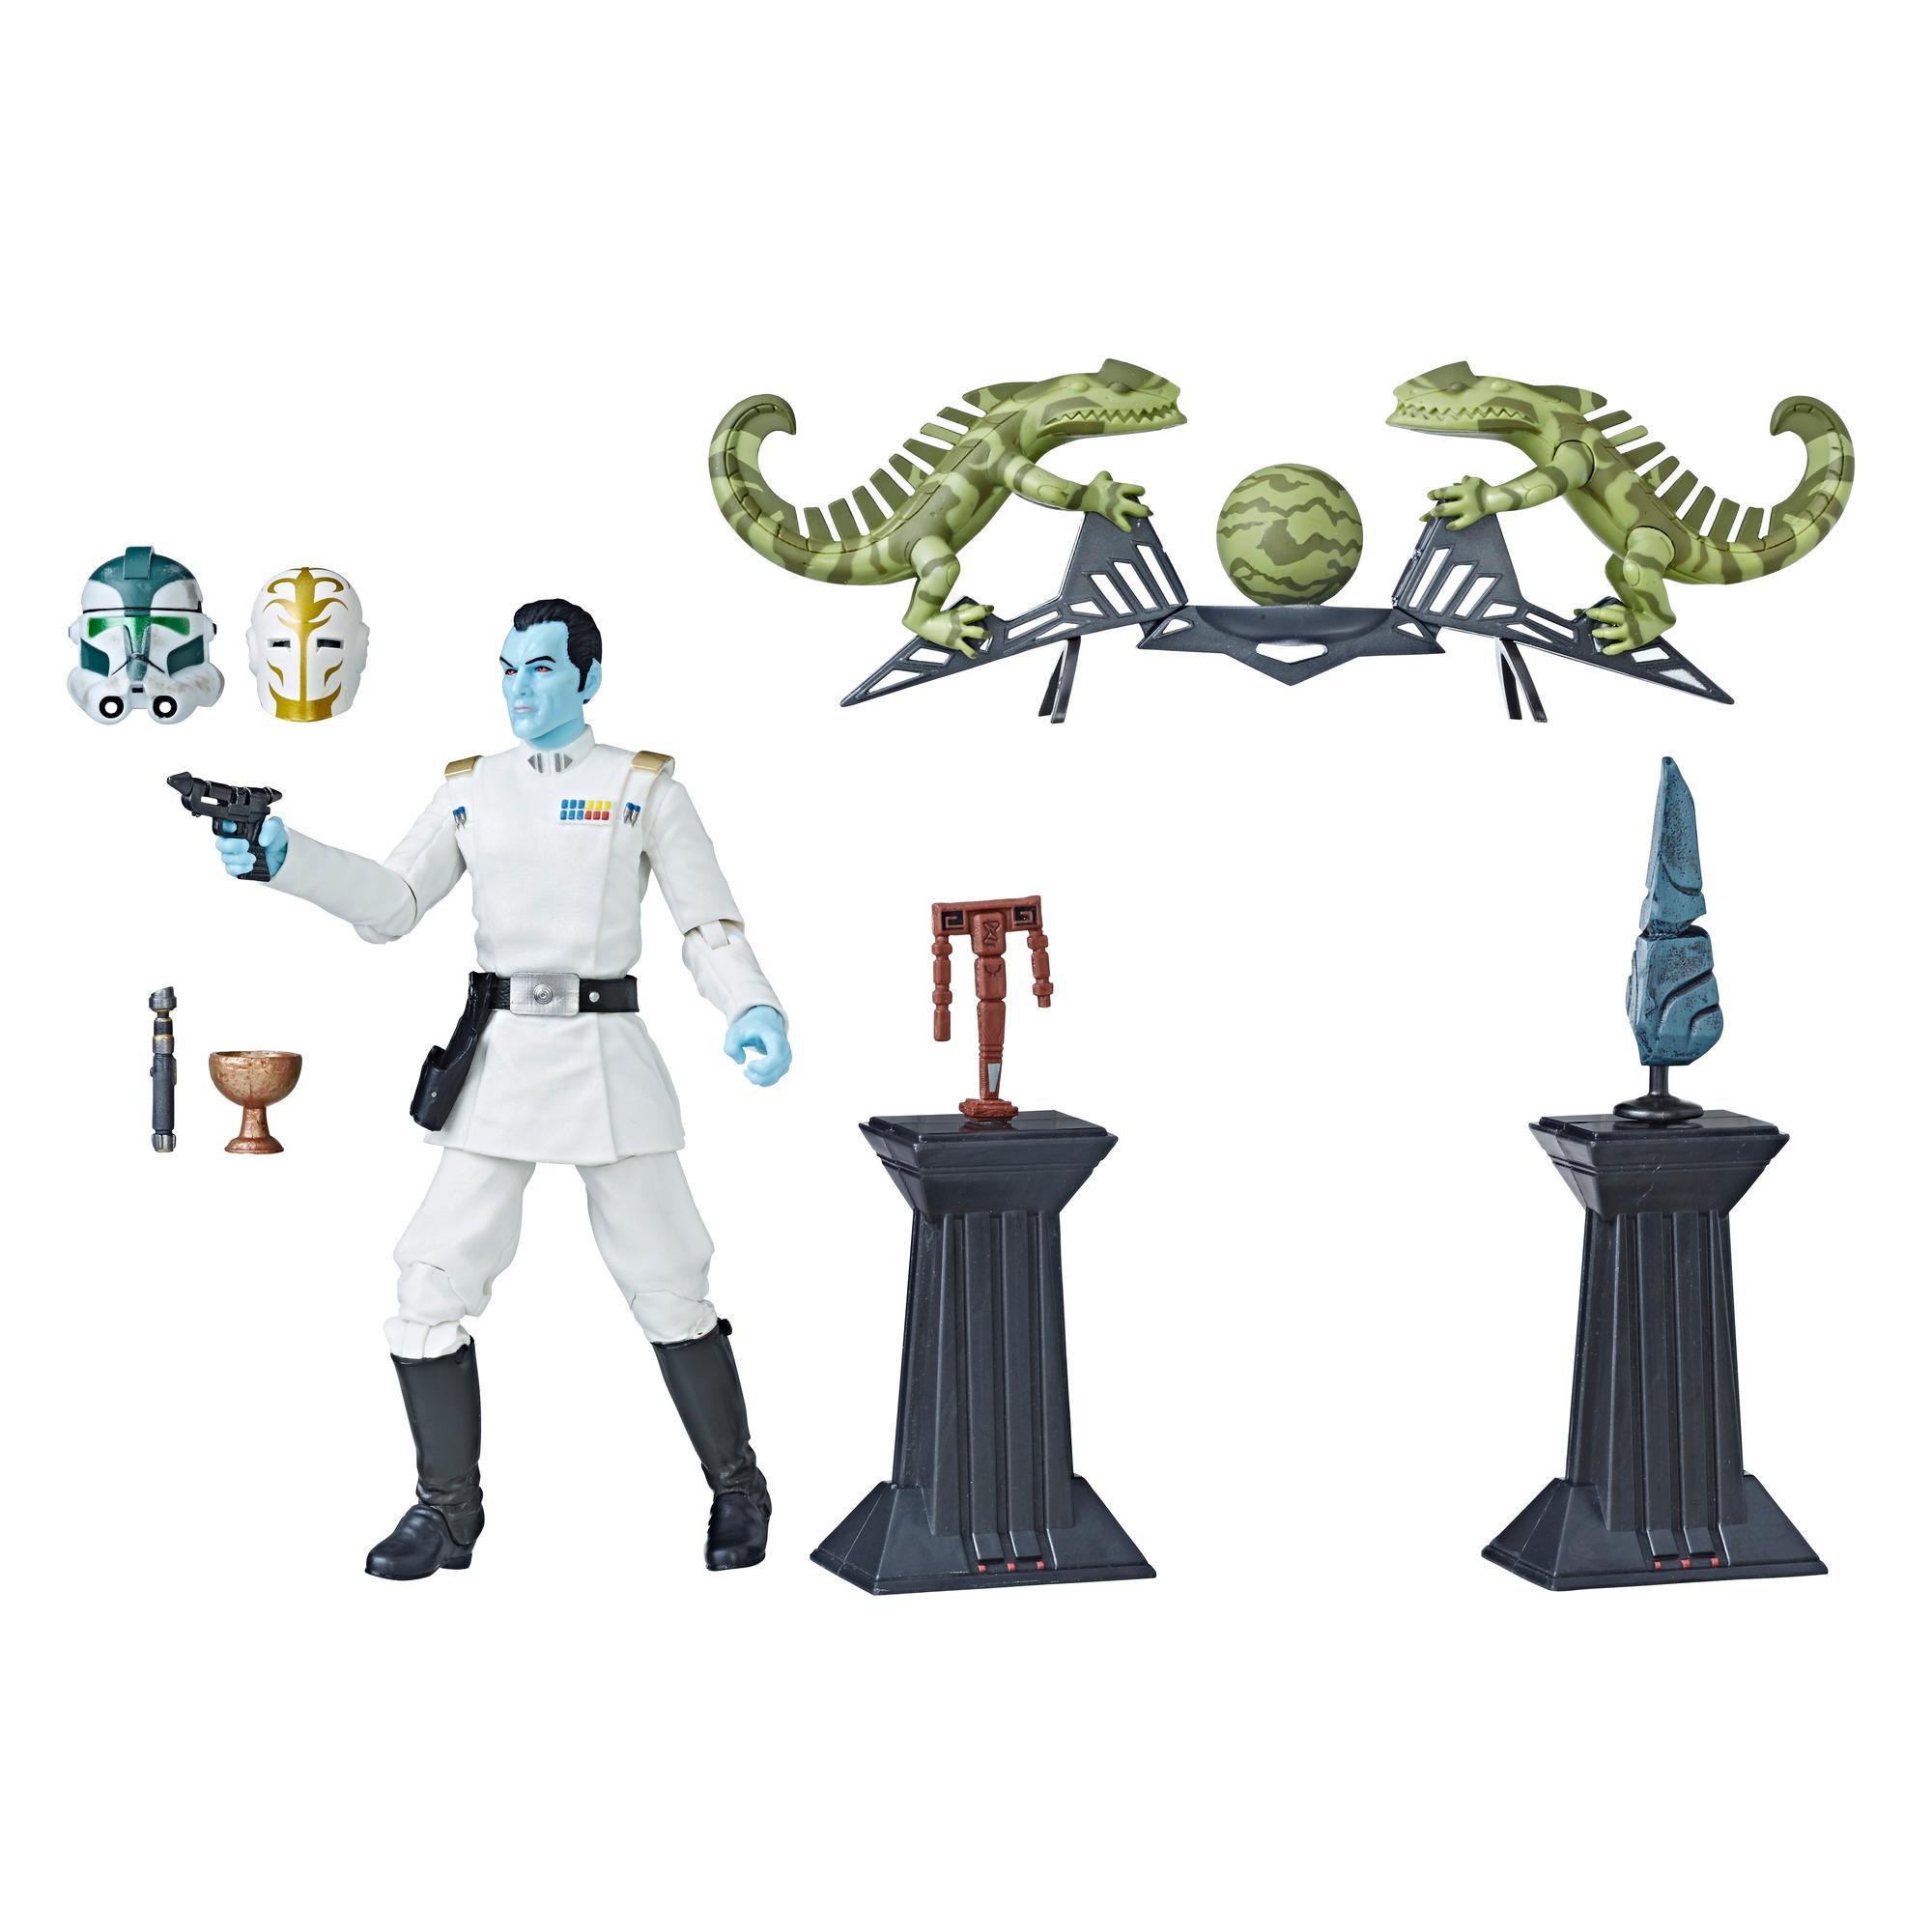 Star Wars The Black Series Grand Admiral Thrawn